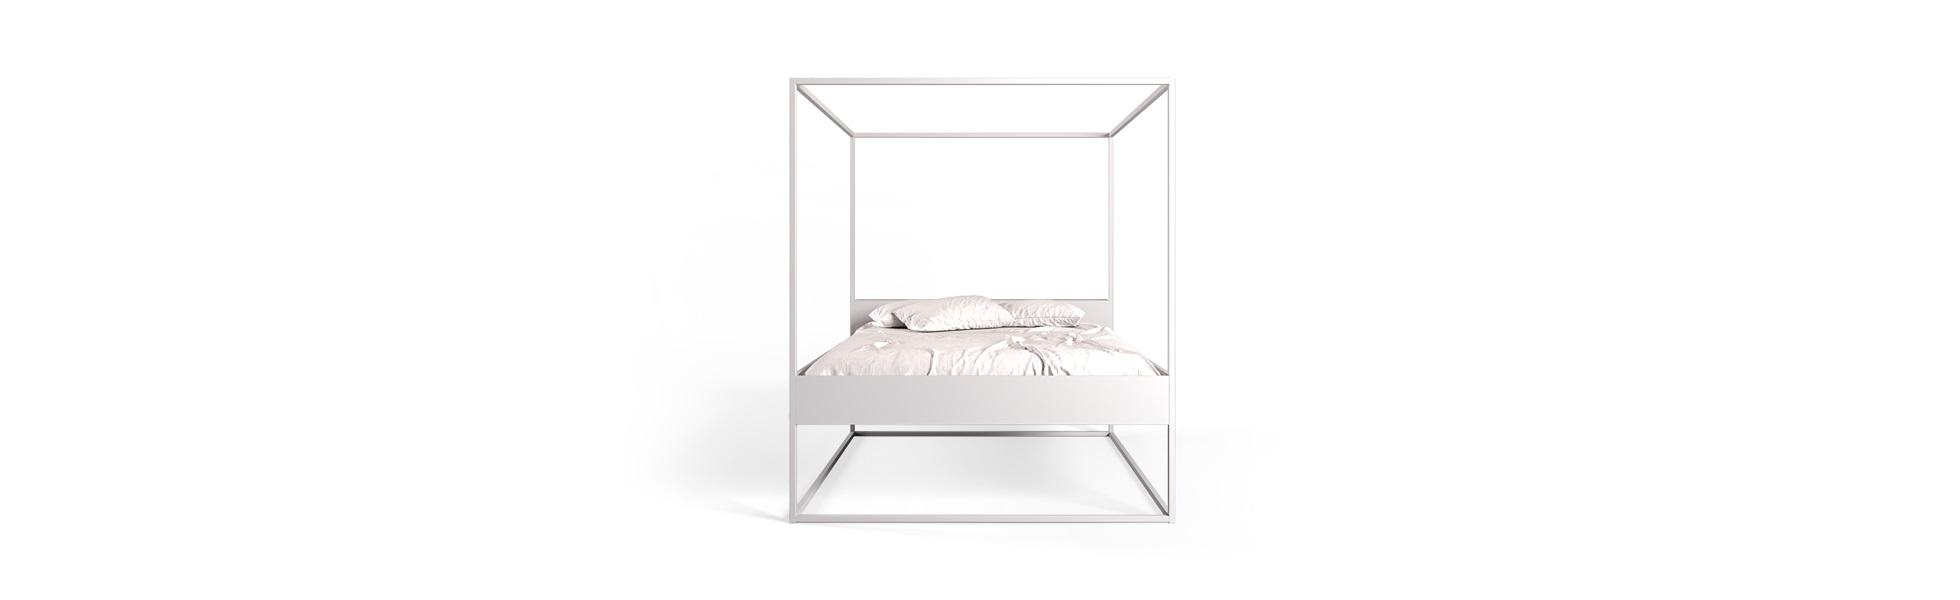 bed-led-himmelbett-mit-touch-leds-filodesign-sas